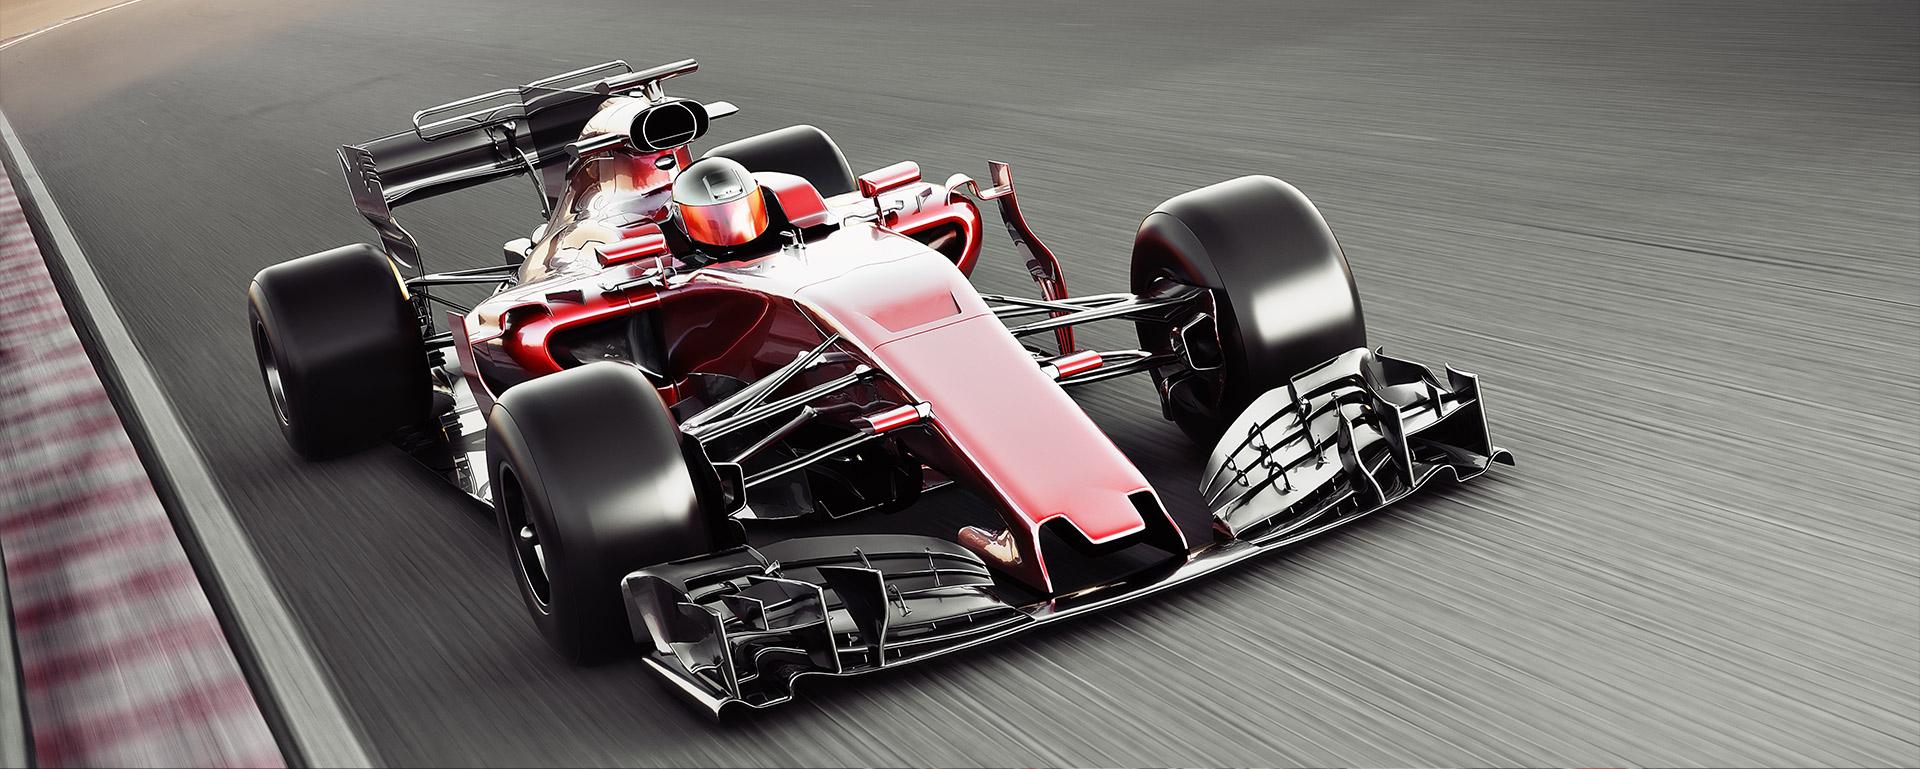 Italian Grand Prix 2021 F1 Race